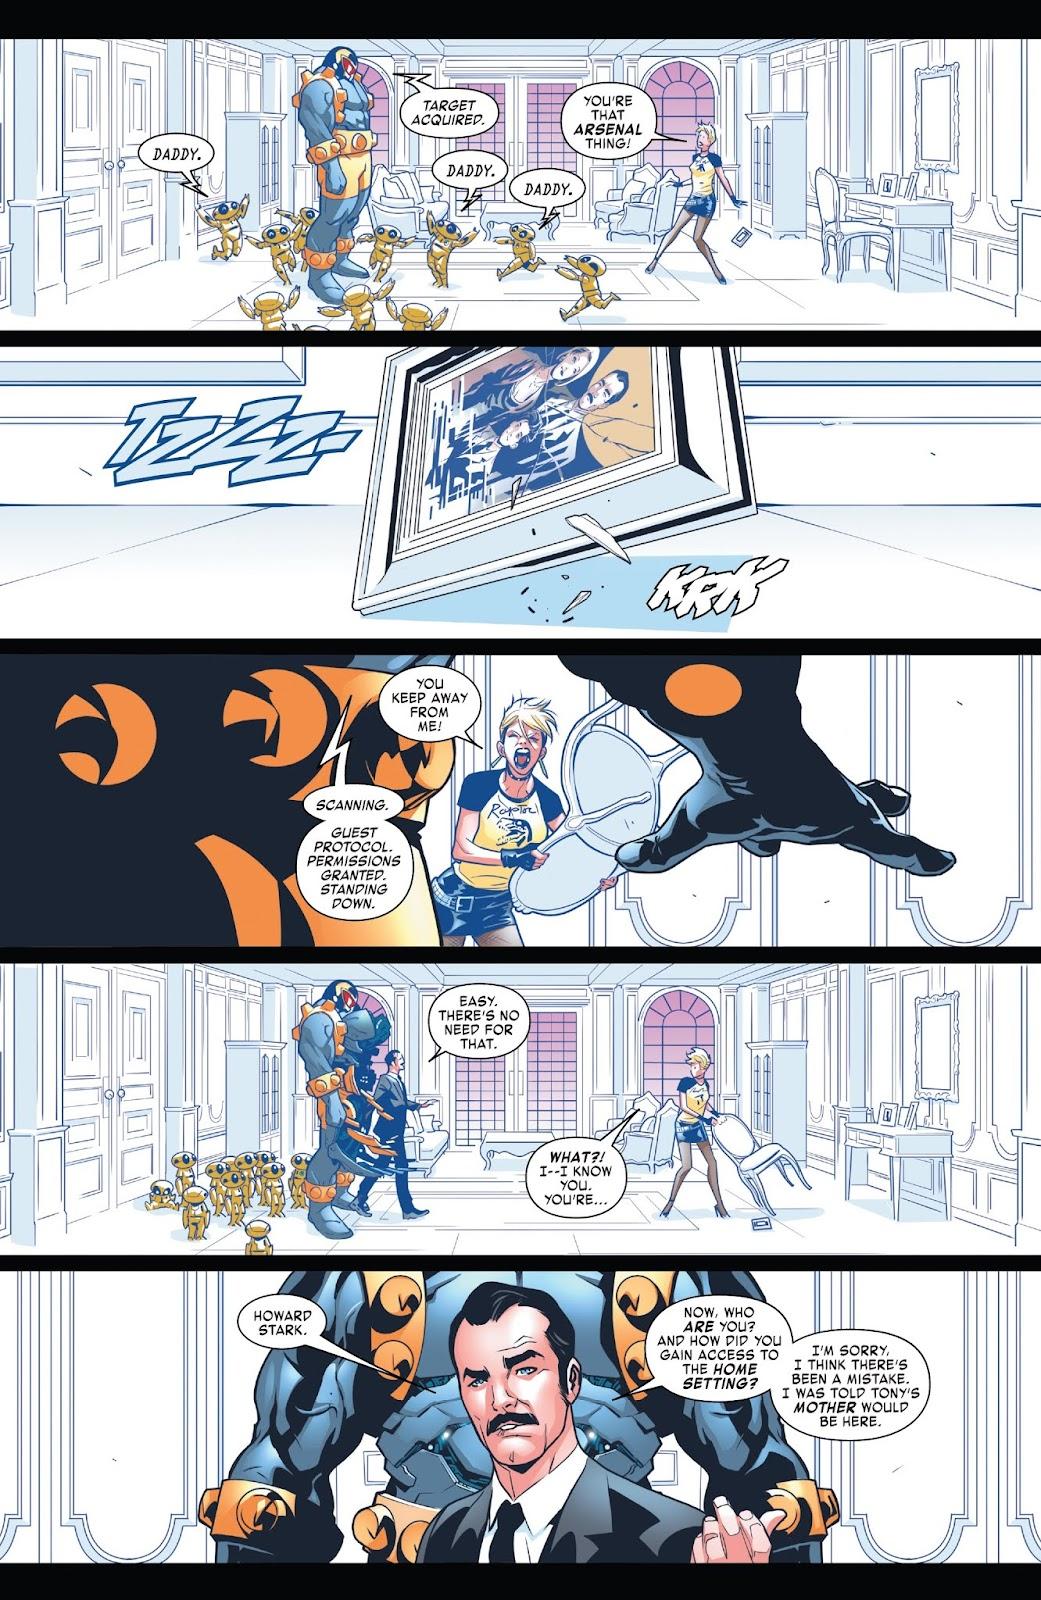 Read online Tony Stark: Iron Man comic -  Issue #7 - 9